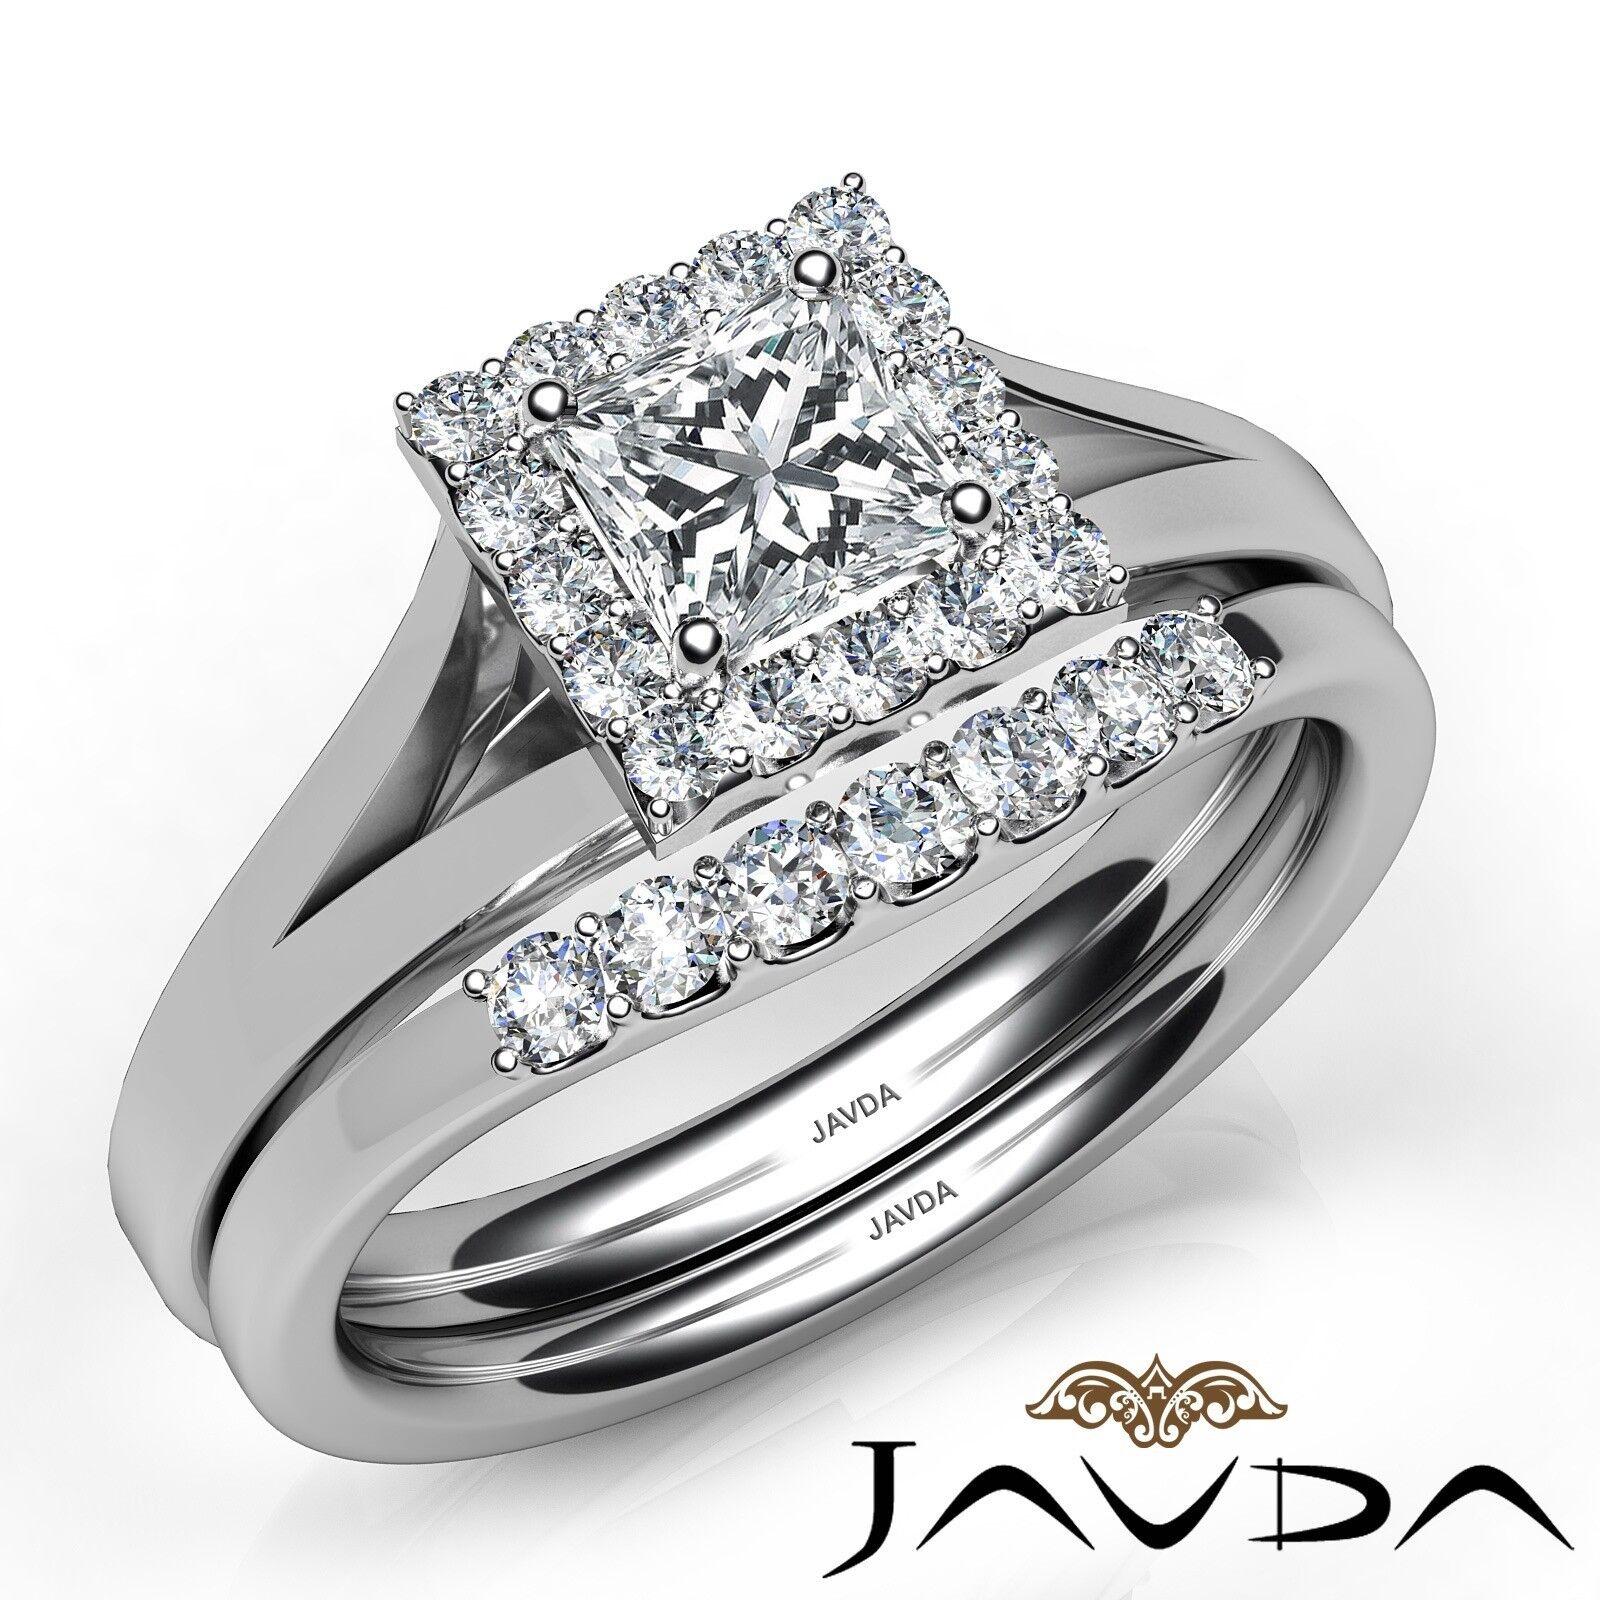 0.93ctw Halo Pave Bridal Princess Diamond Engagement Ring GIA F-VVS1 White Gold 1